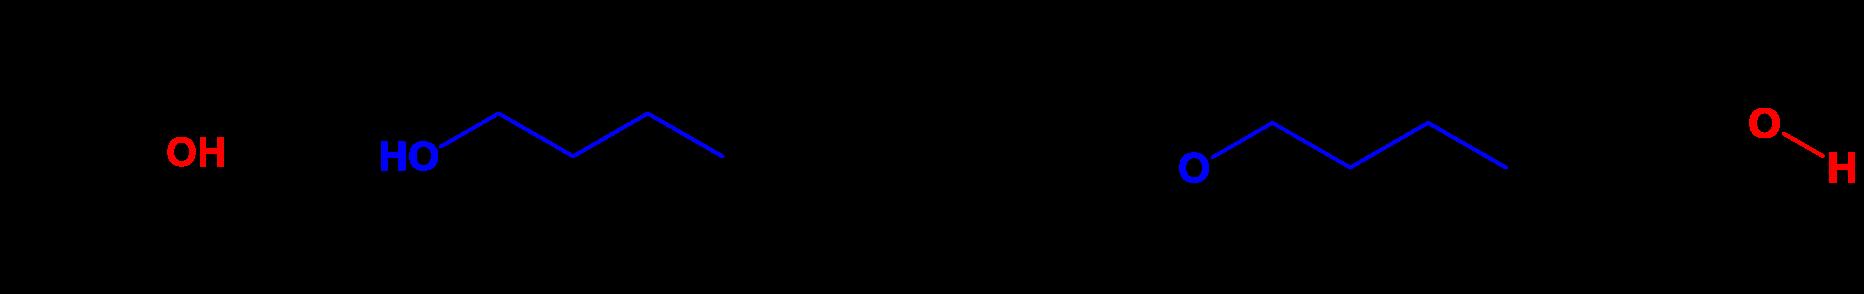 online Heat Transfer Calculations 2006